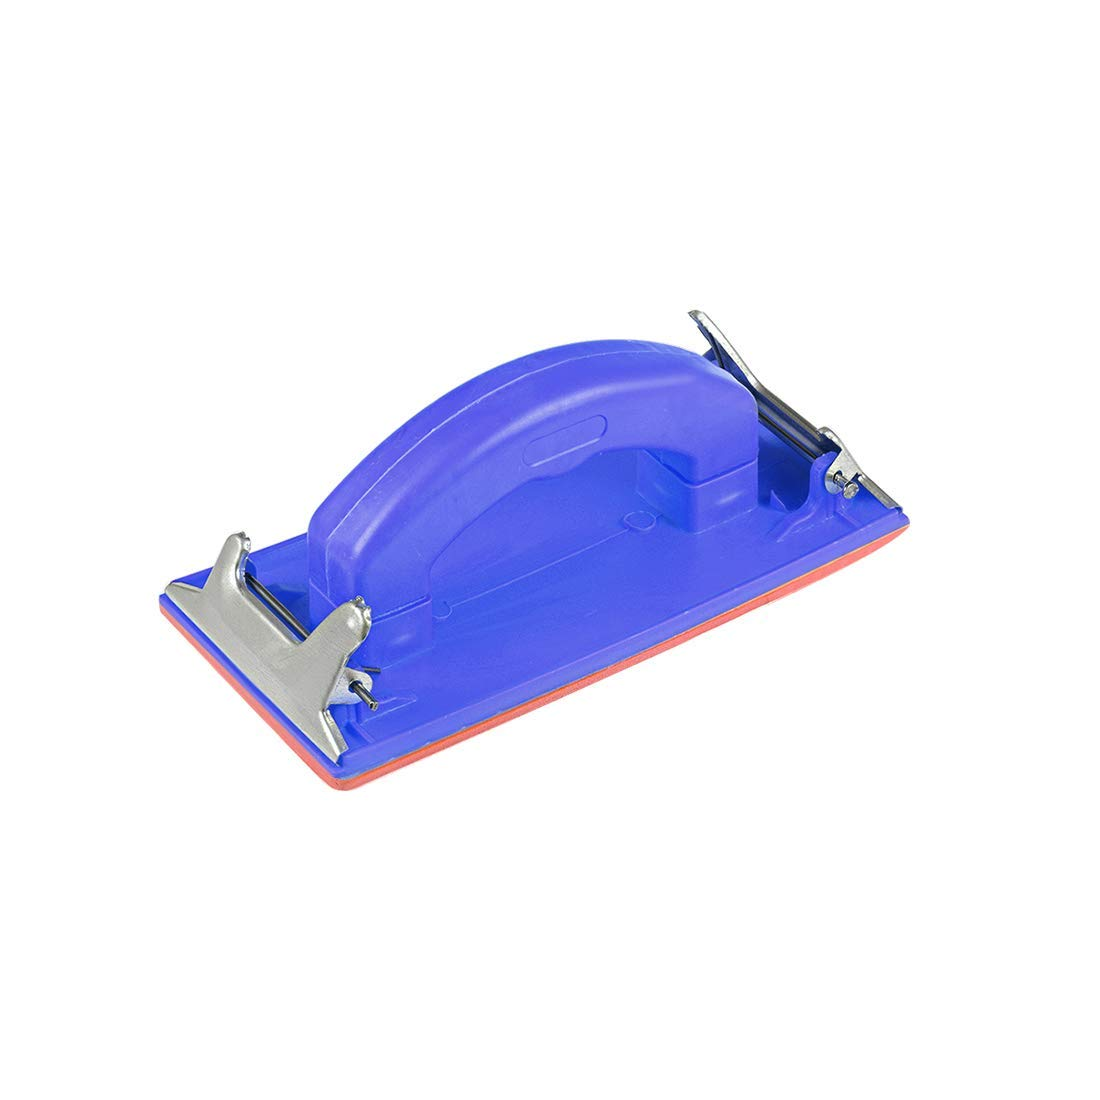 polishing Blue polishing Sander Block 7x3.4 Inch Sandpaper Holder Hand Tool with Plastic Handle for Wall Sanding